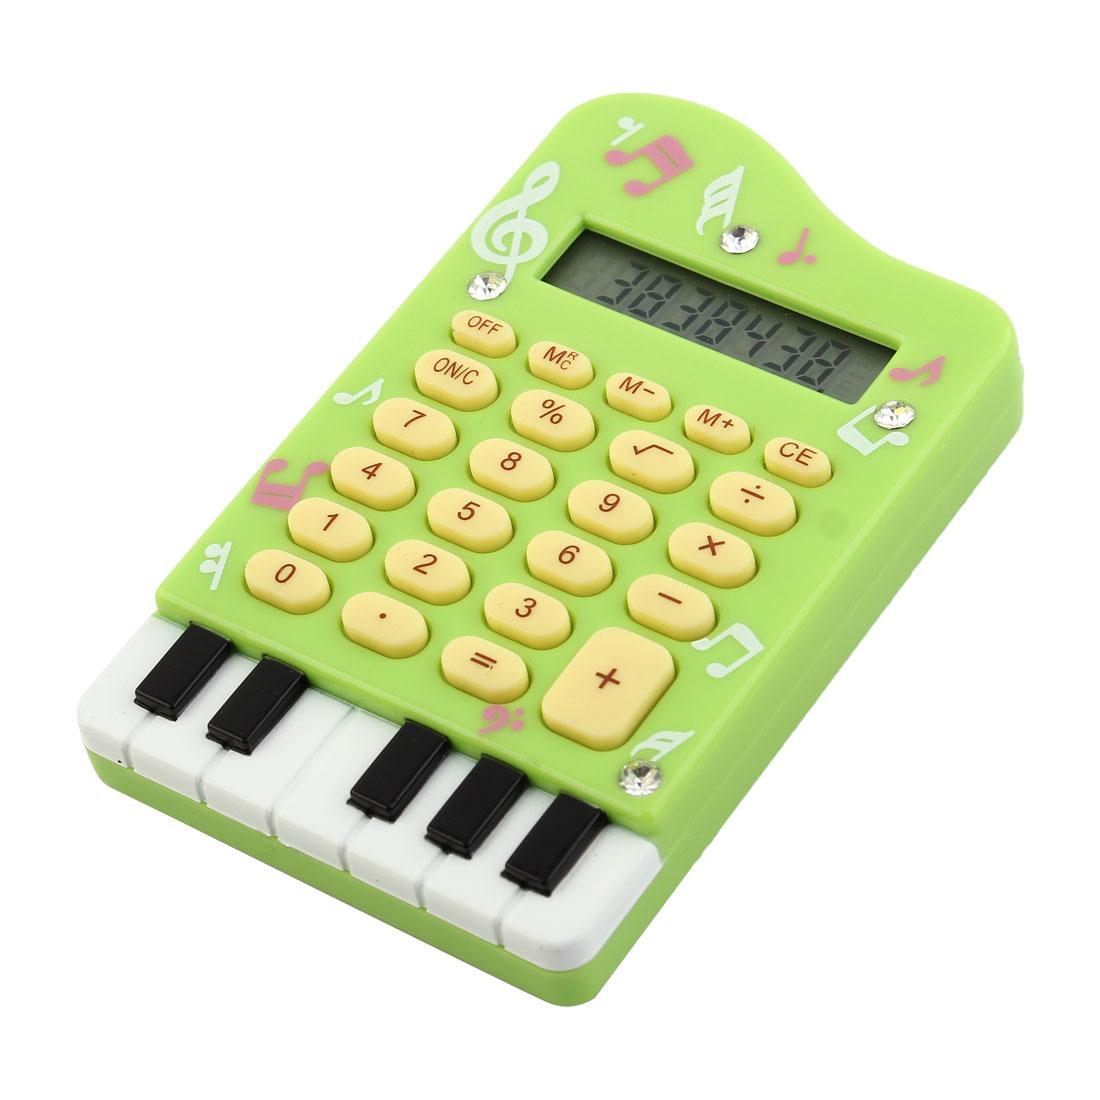 Office School Student Piano Design Portable 24 Keys Electronic Calculator Green